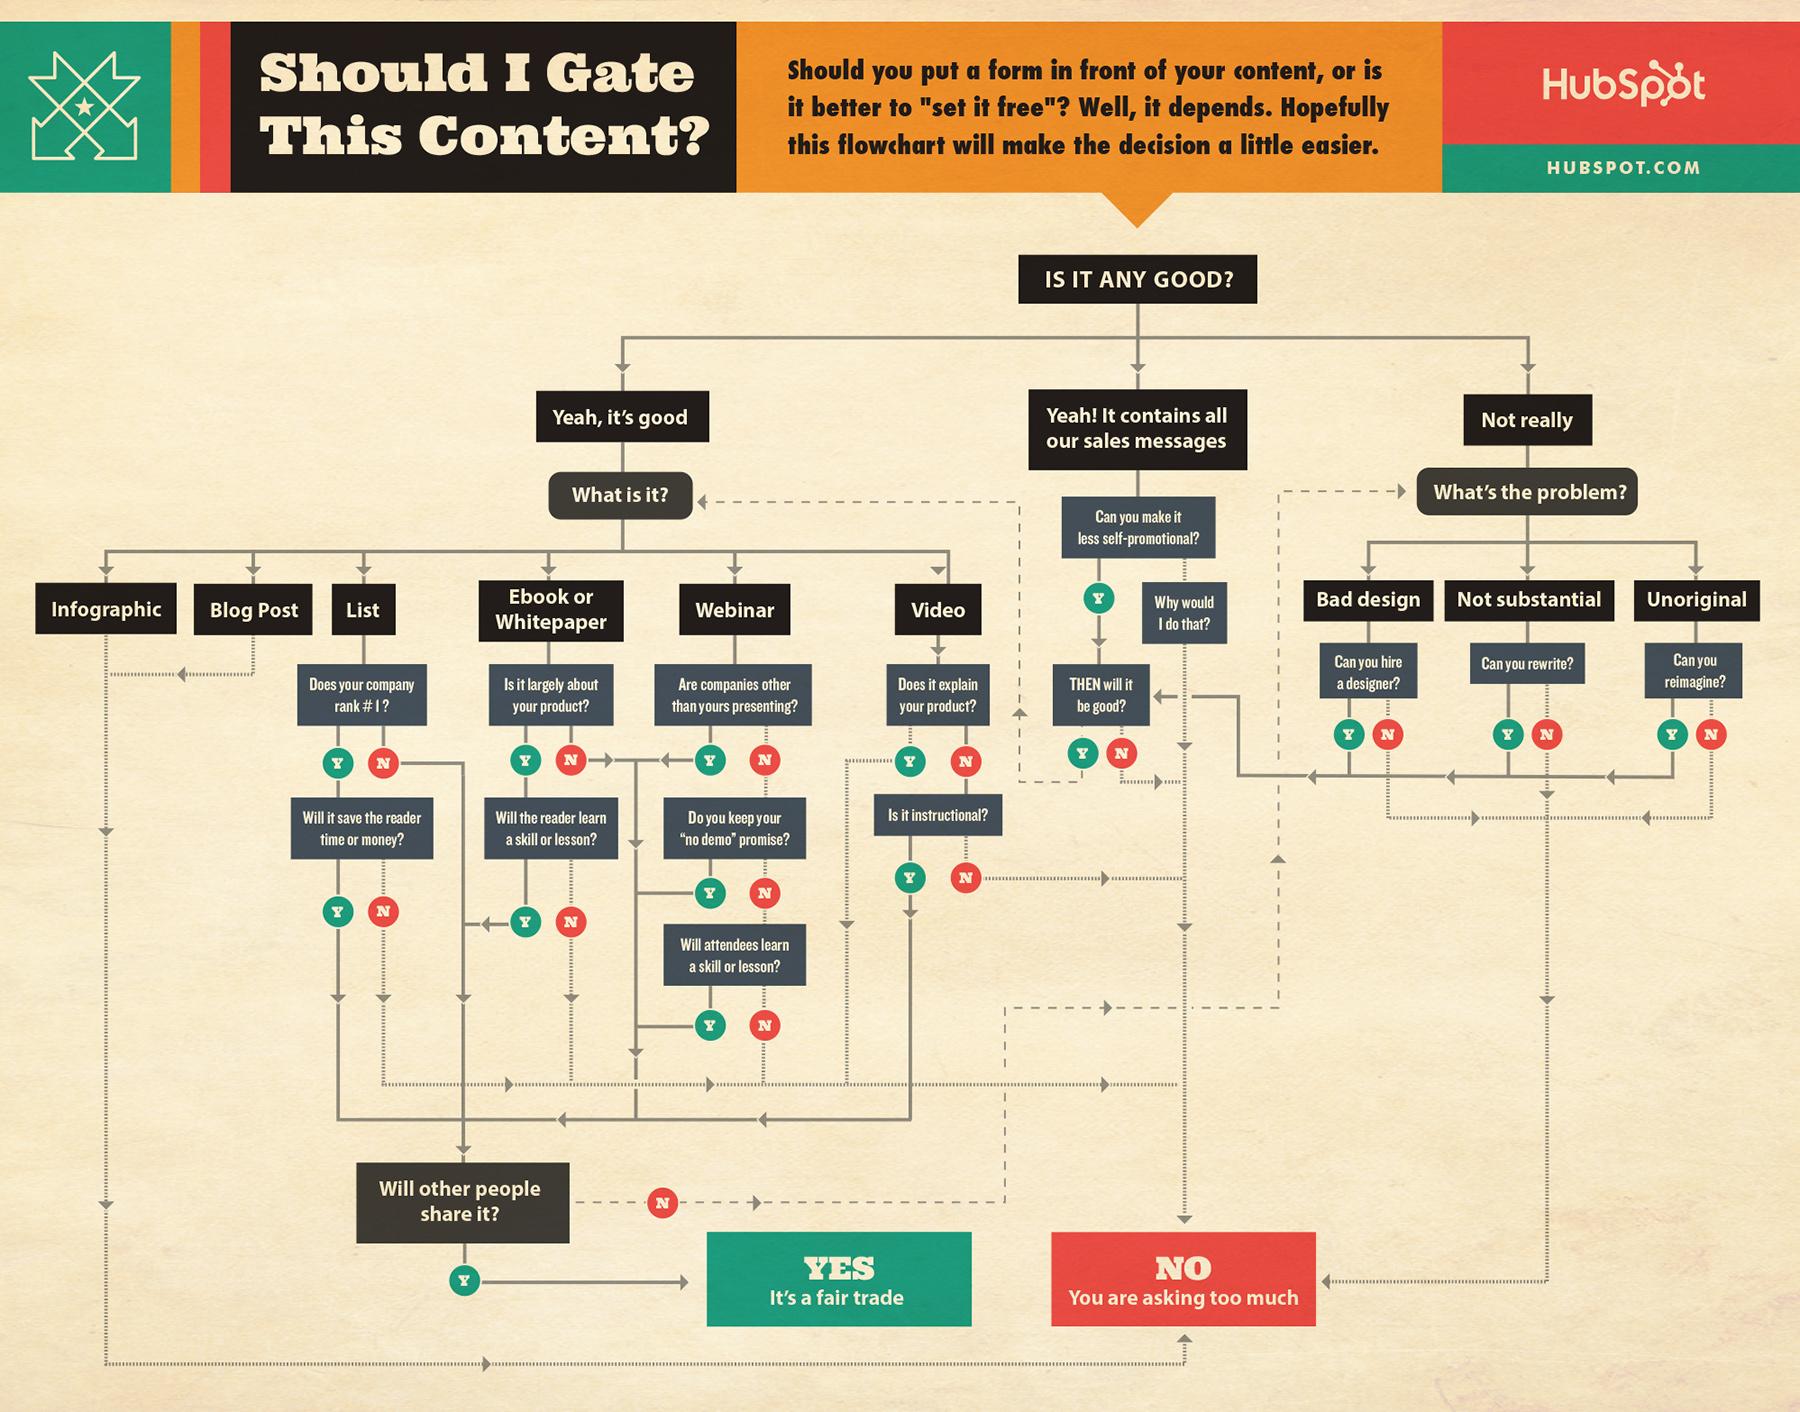 HubSpot Gated Content Workflow